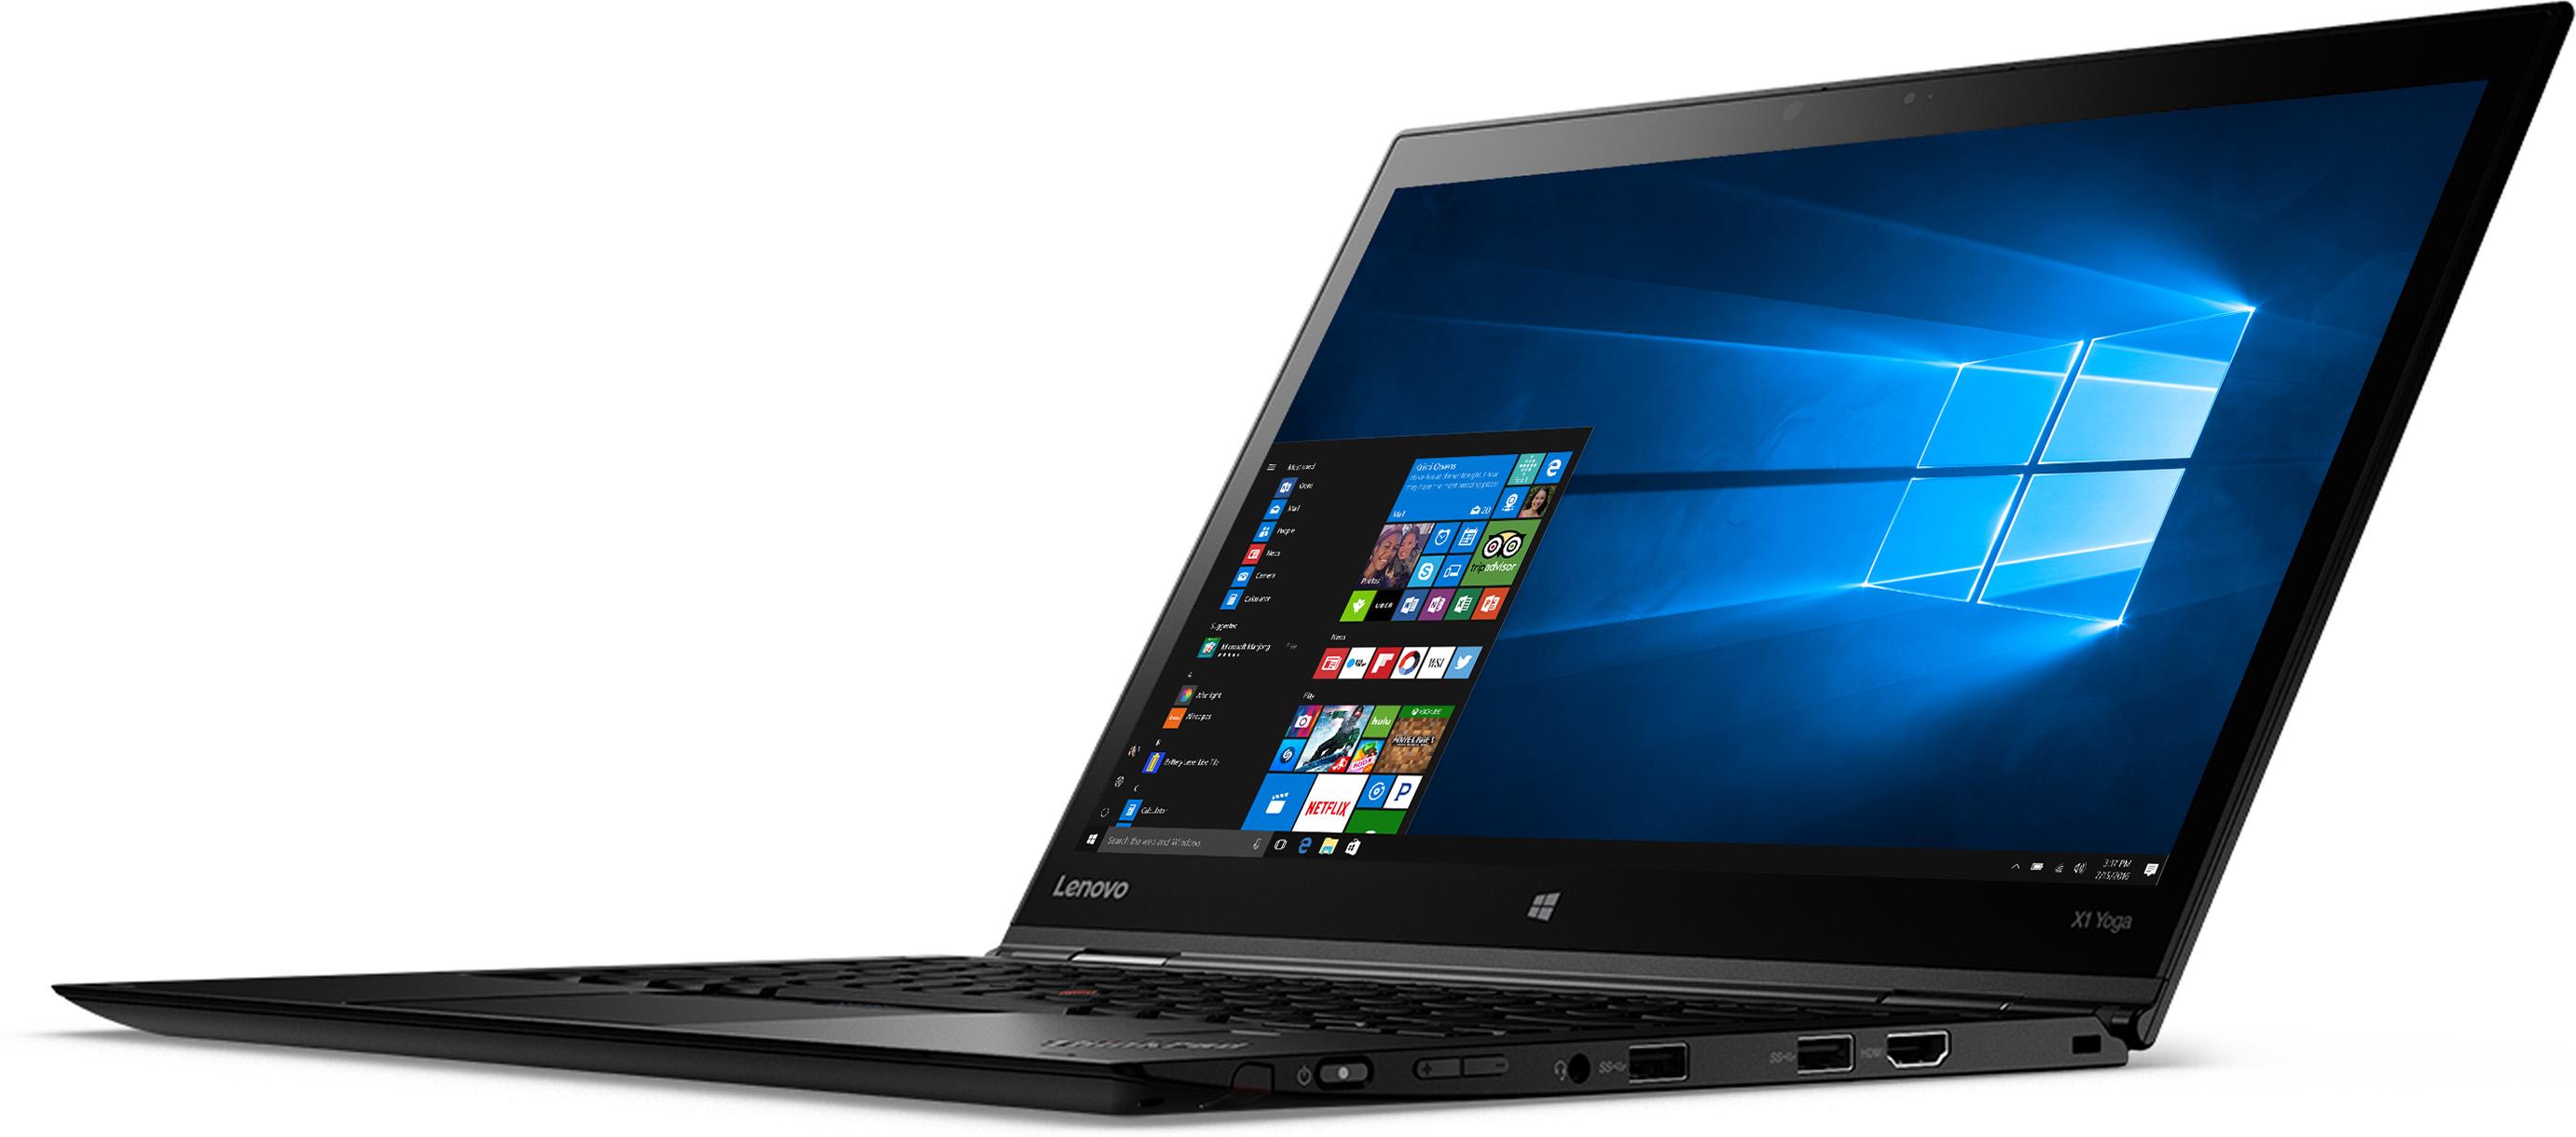 Lenovo ThinkPad X1 Yoga 20JES0CS00 2 in 1 PC Deal